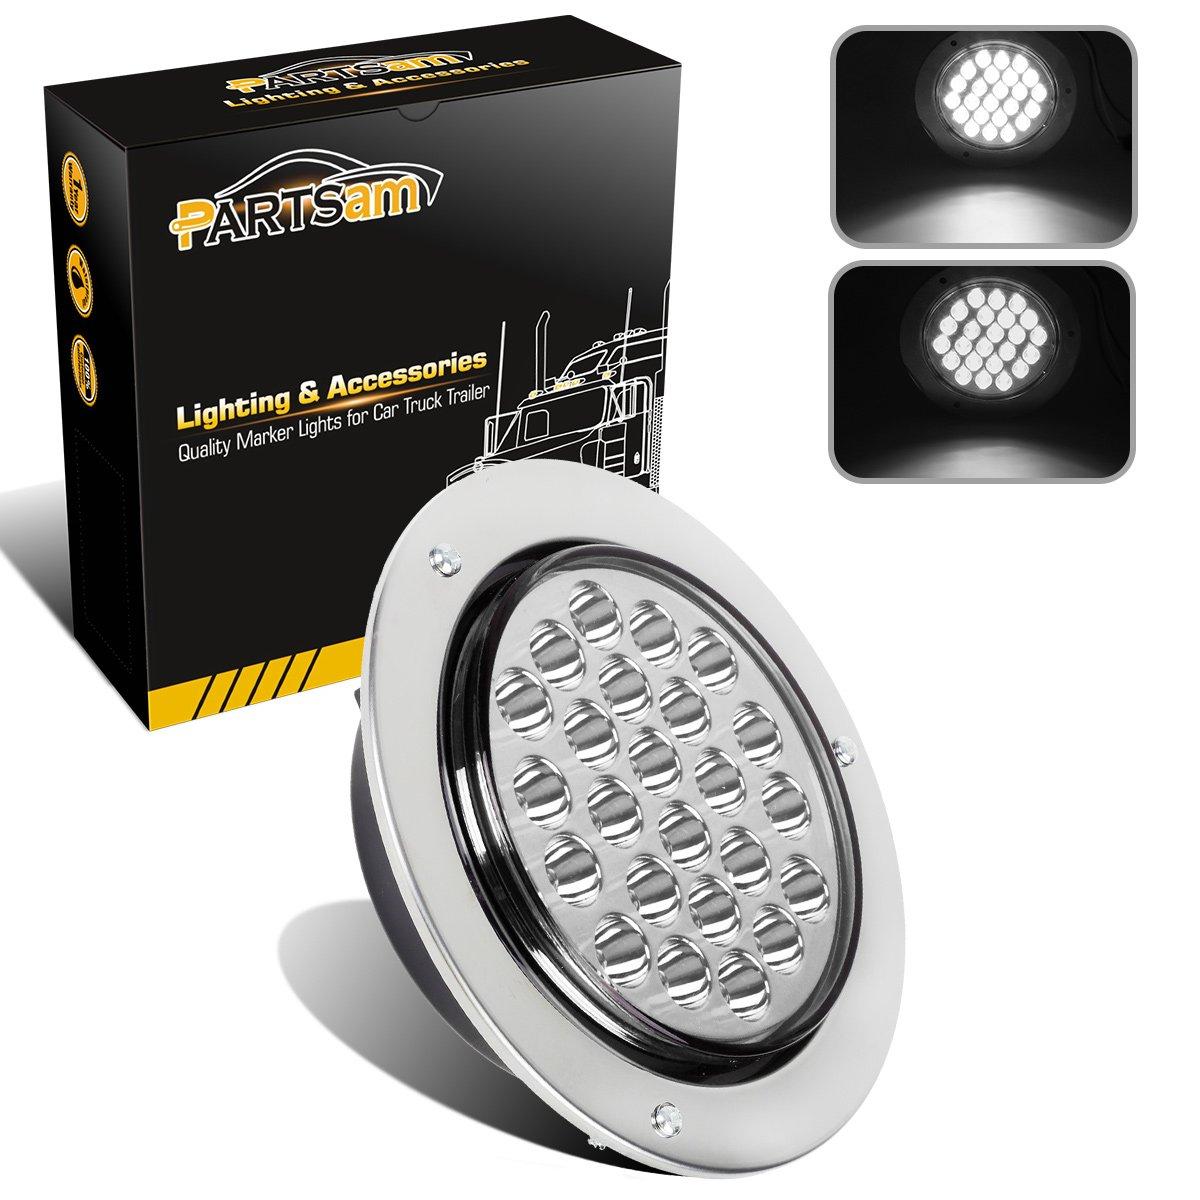 "Amazon.com: Partsam 1pc 4"" Round 24 LED White Reverse Stop Turn Tail Backup  Light Waterproof w/ Chrome Ring: Automotive"